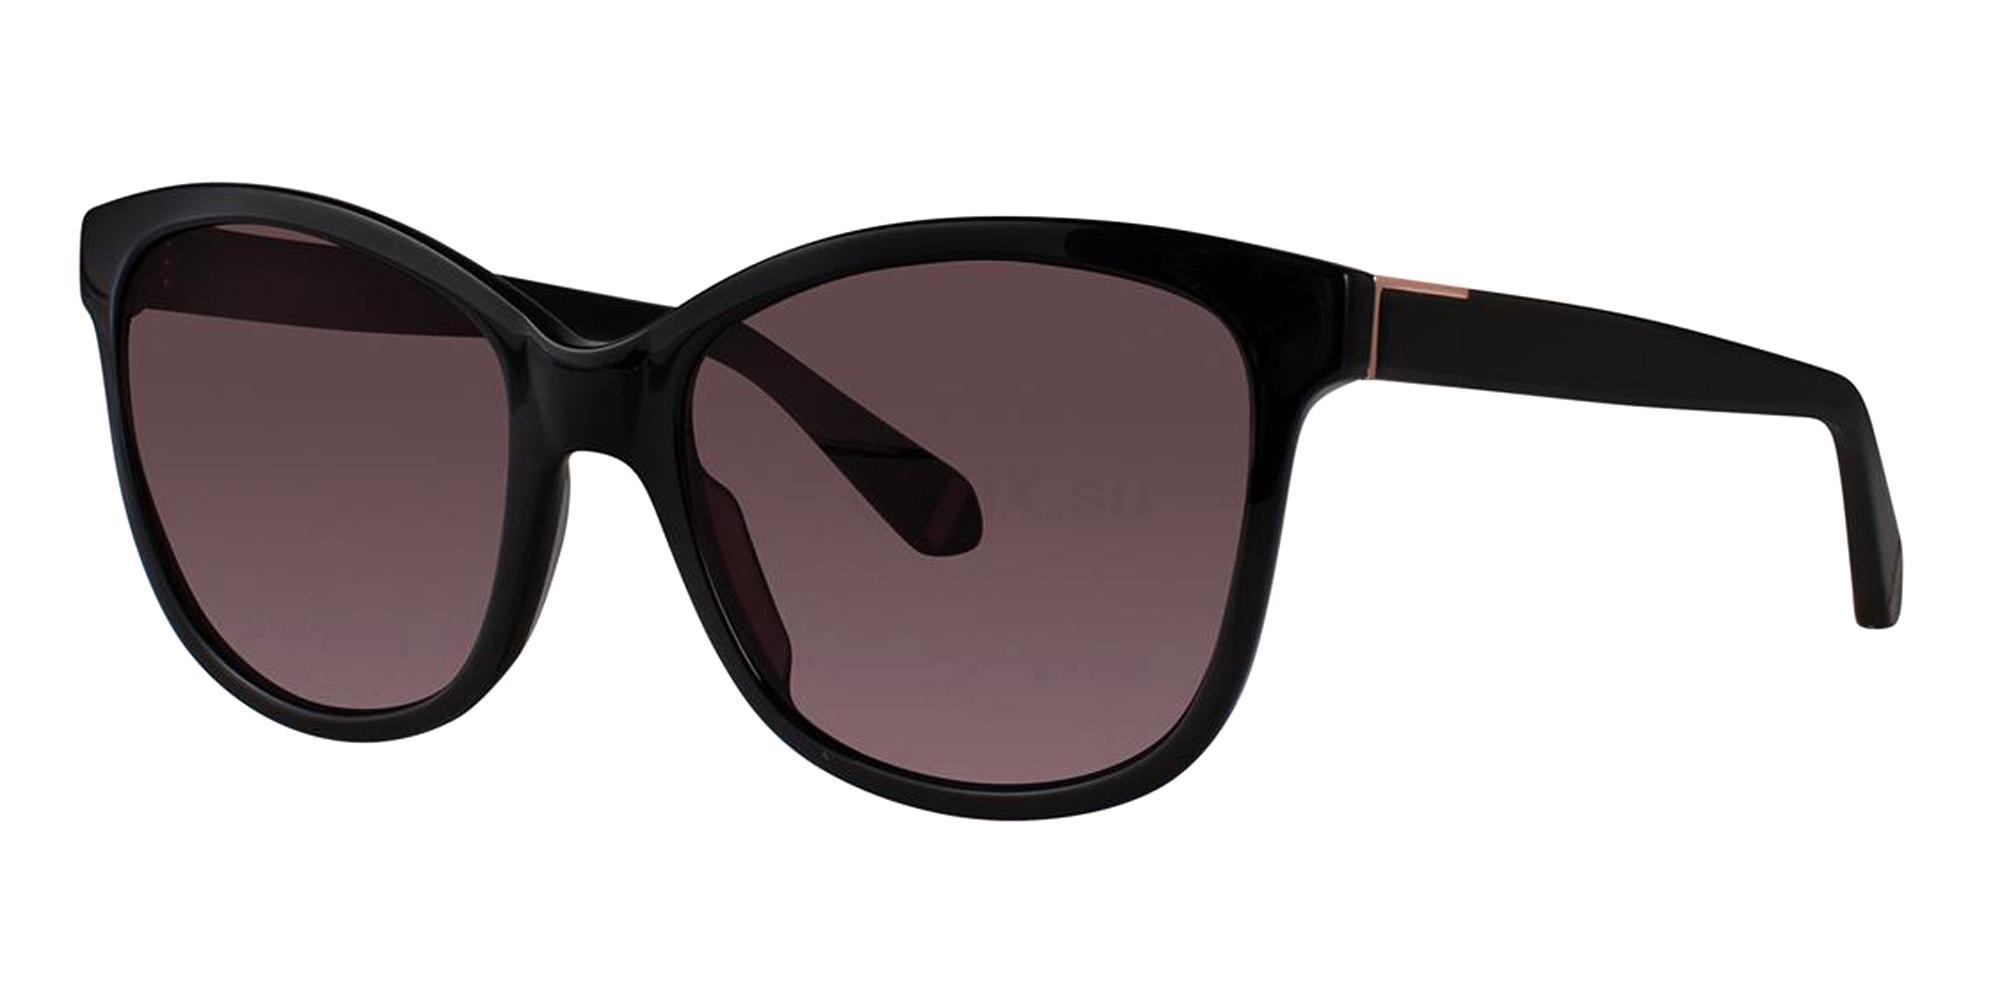 Black ELOYSE Sunglasses, Zac Posen